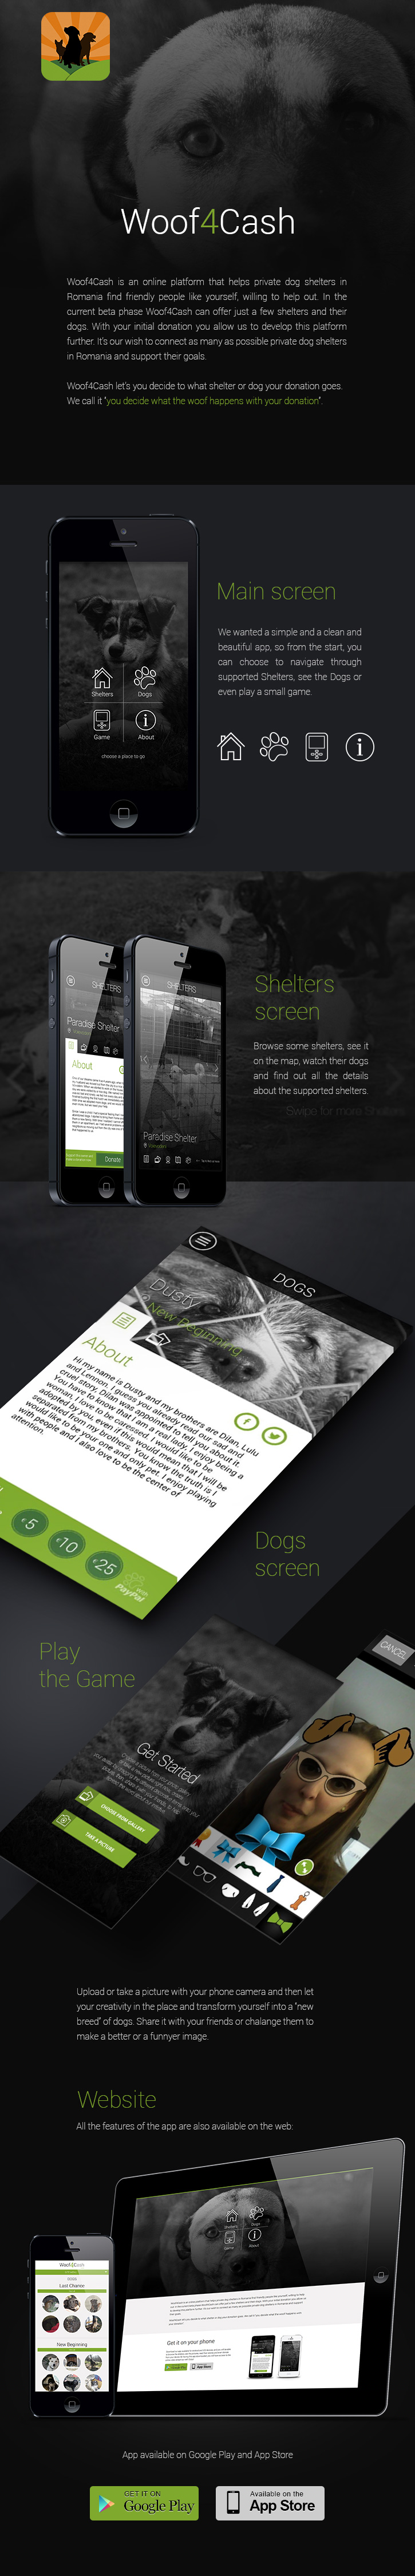 Woof4Cash App